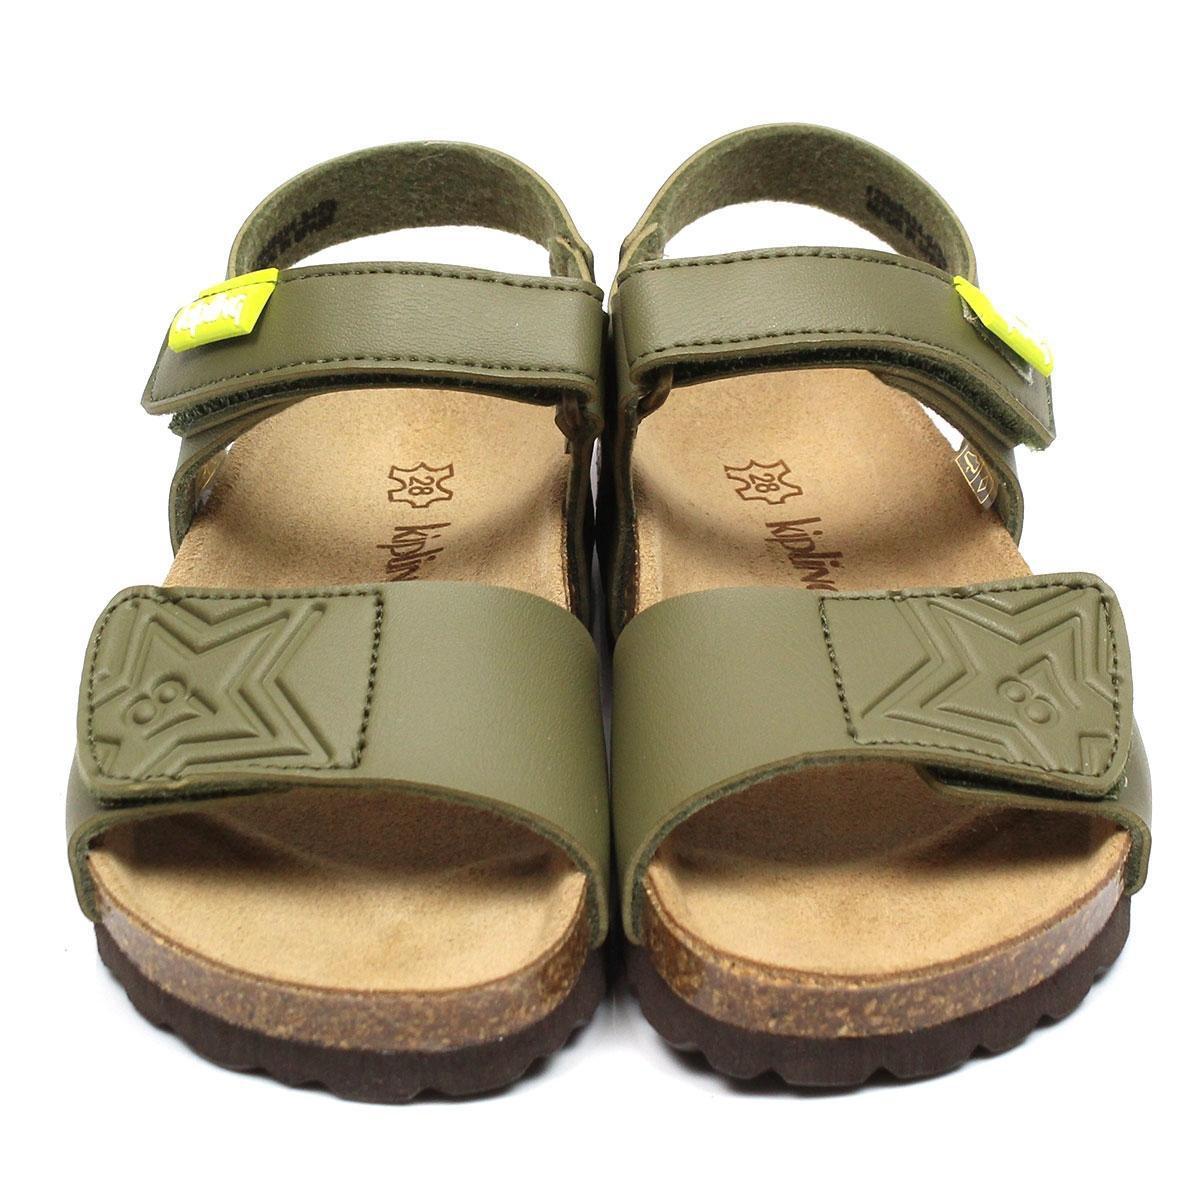 Kipling GUY jongens sandaal groen, ,28